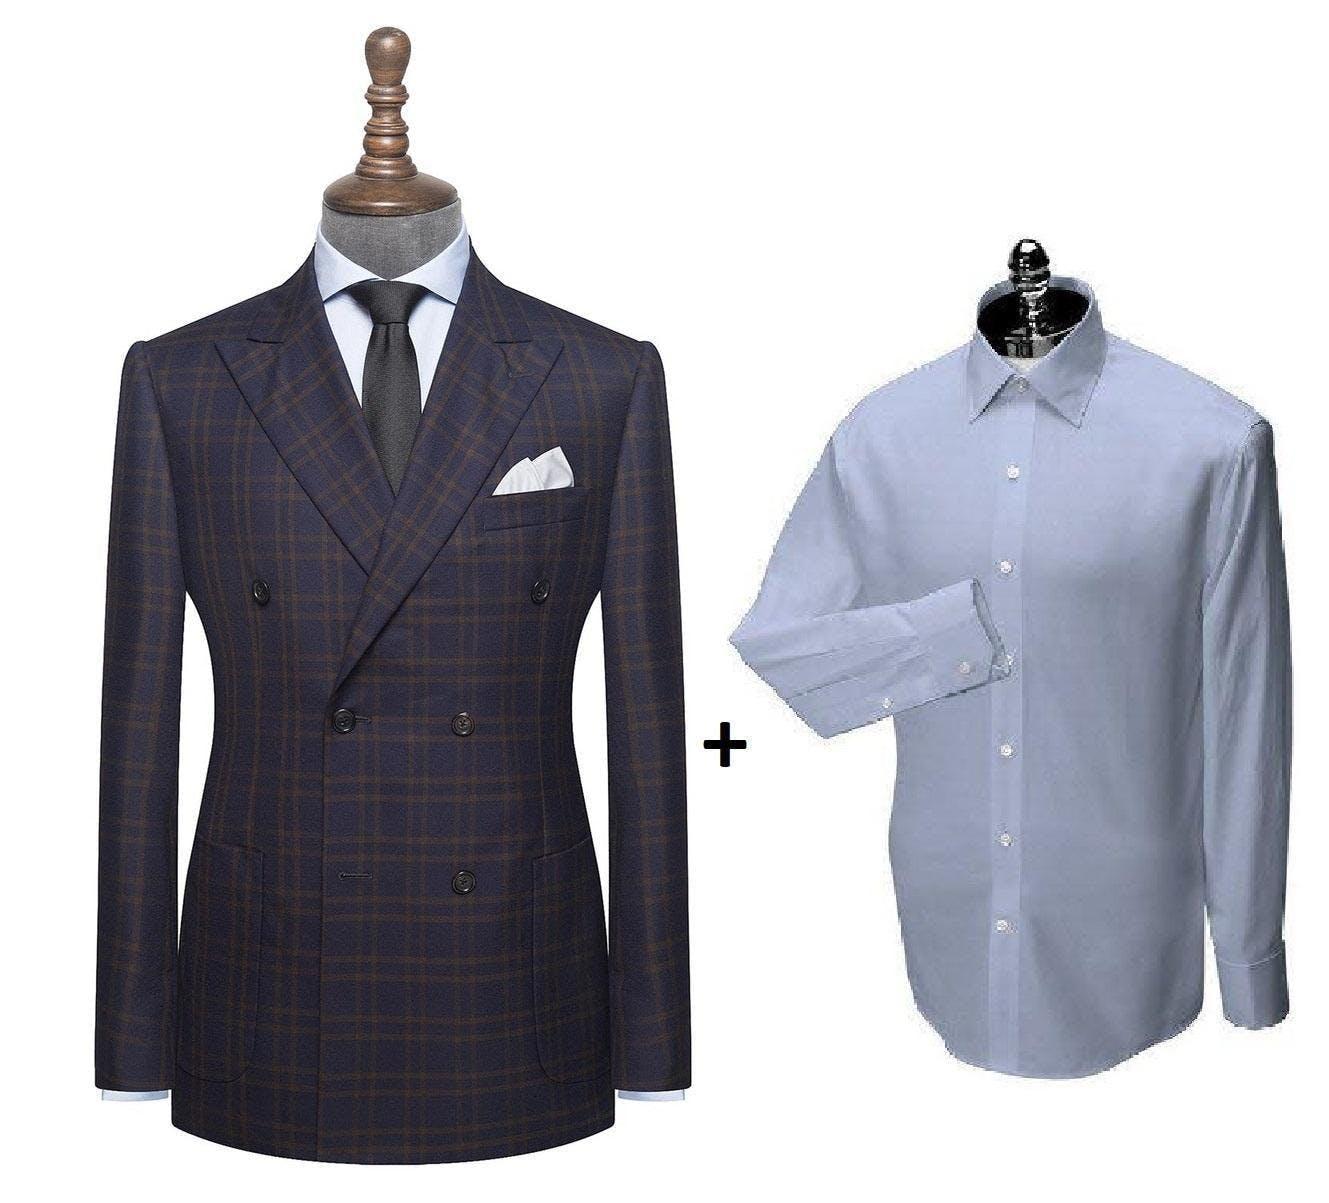 Get It Custom Made To Measure Custom Suit And Custom Shirt